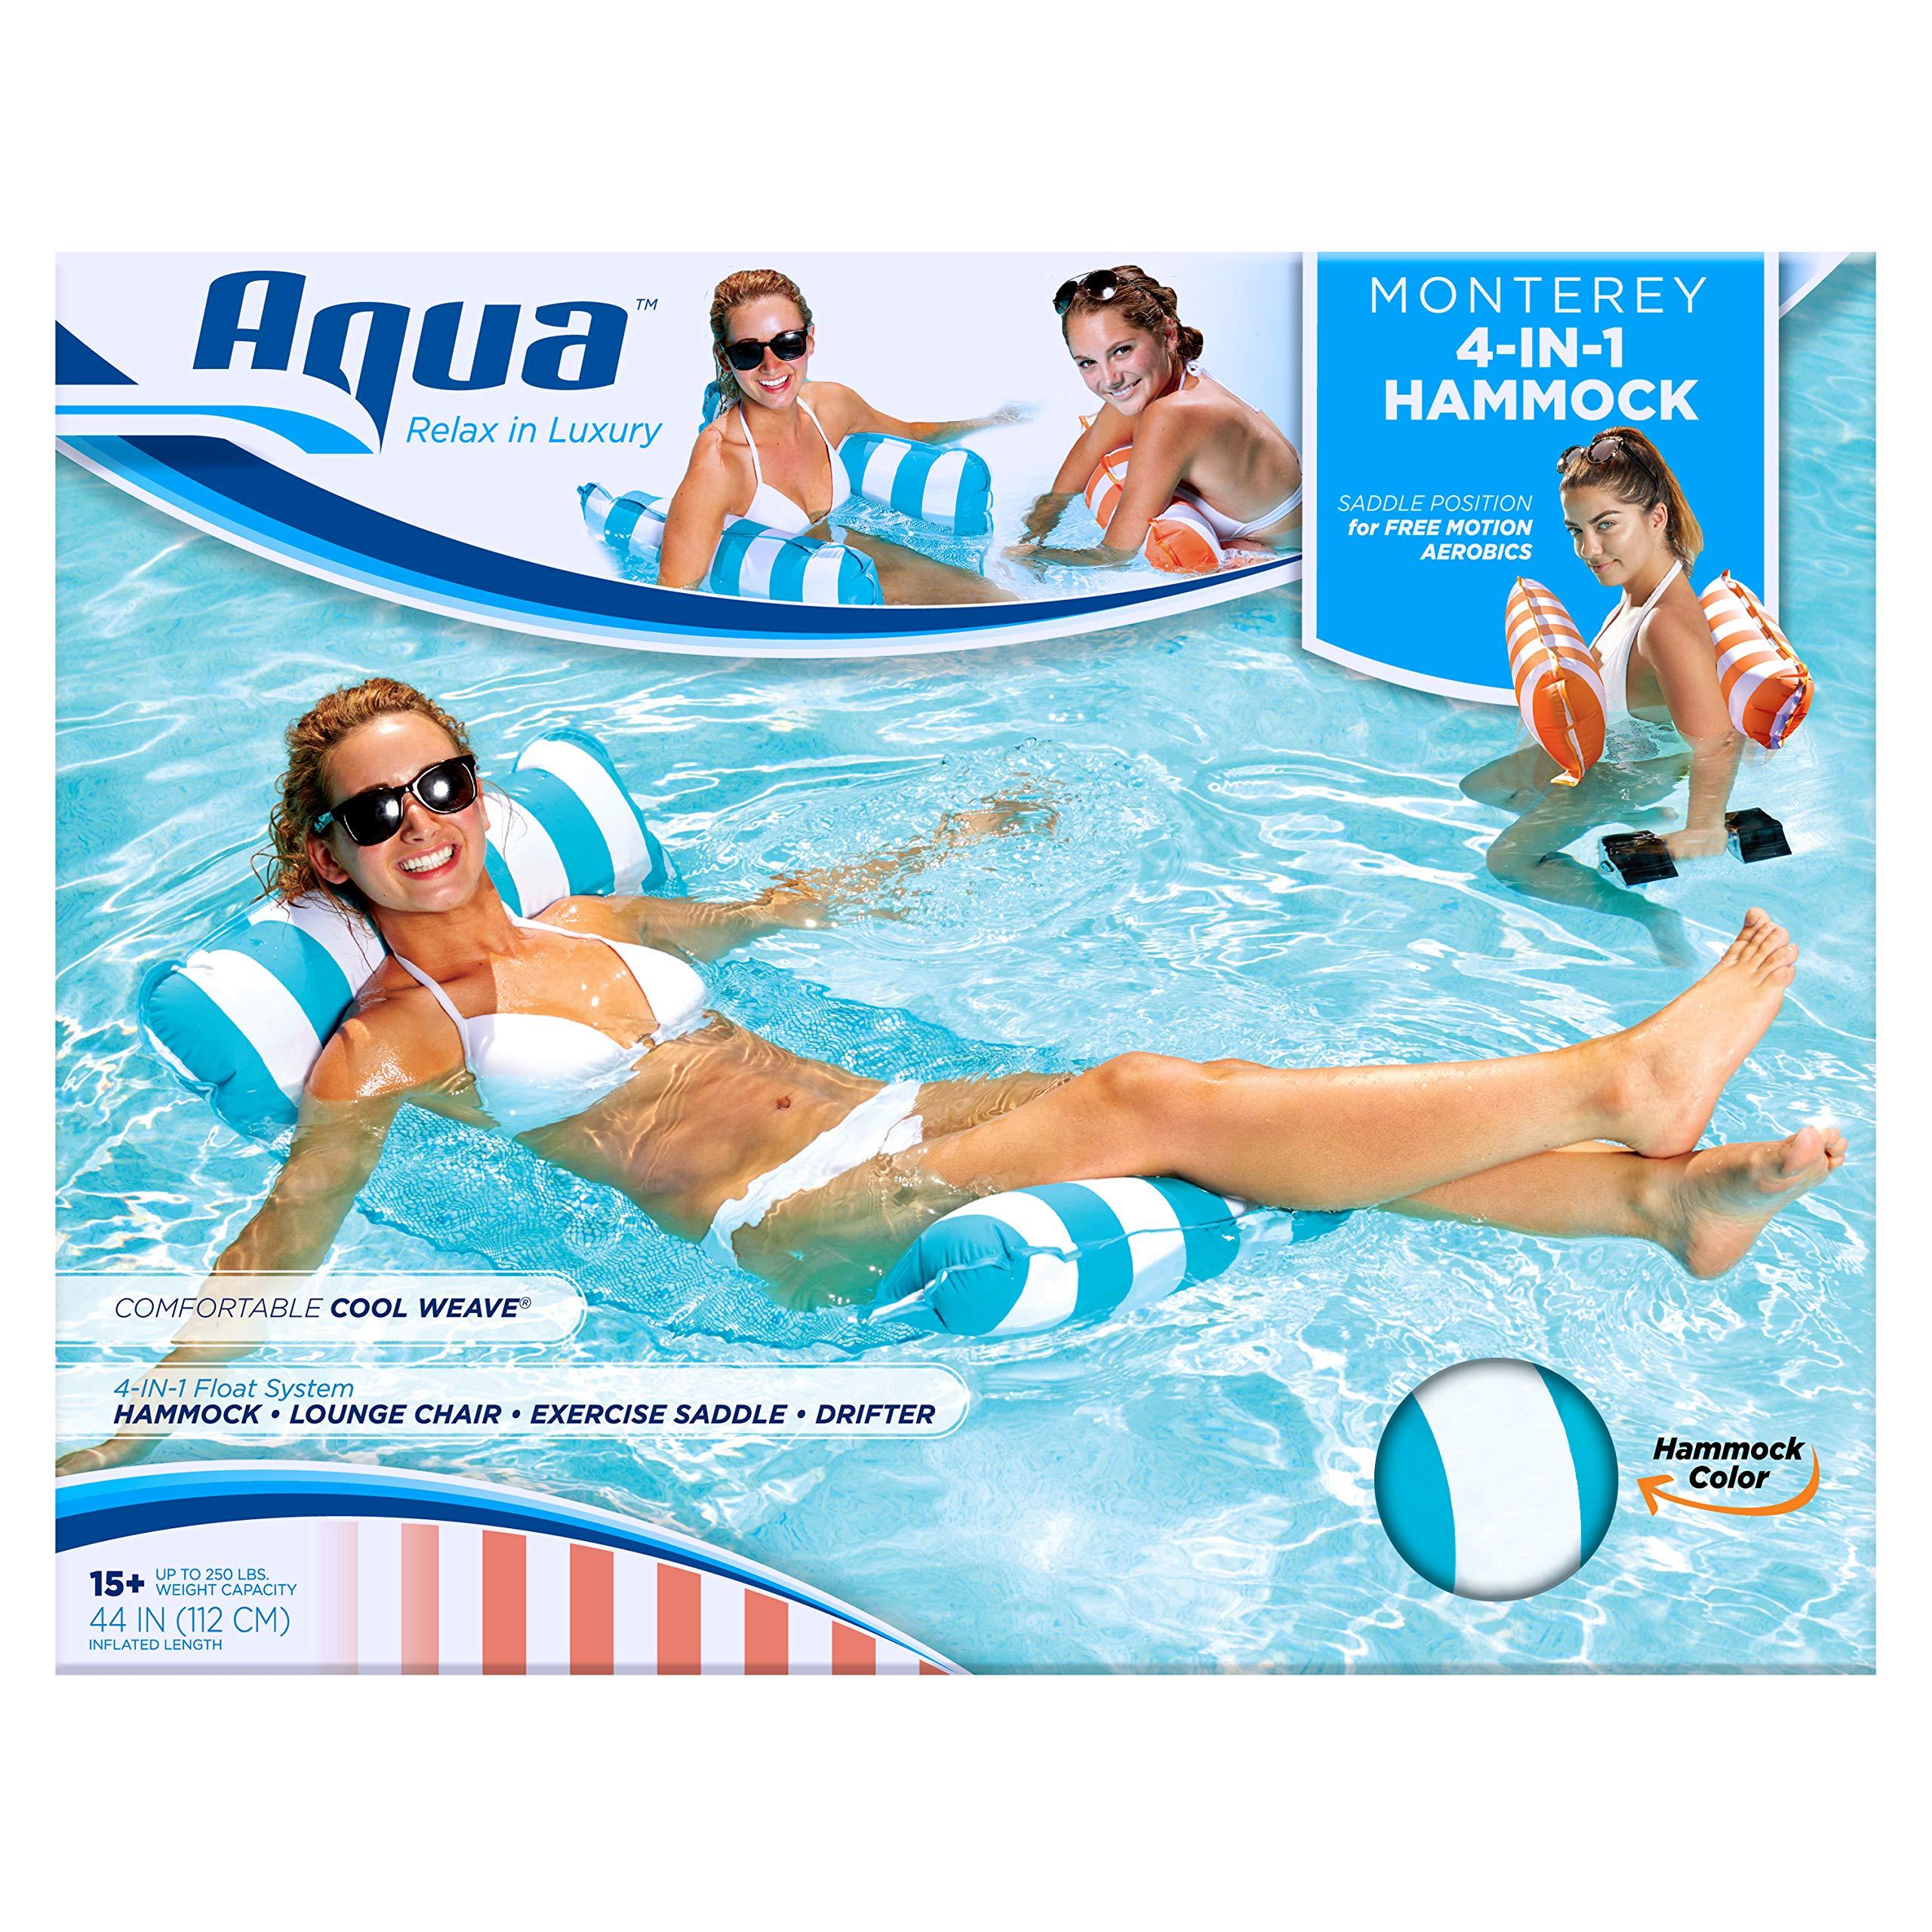 Aqua Monterey 4-in-1 Multi-Purpose Inflatable Hammock (Saddle, Lounge Chair, Hammock, Drifter) Portable Pool Float, Light Blue by Aqua (Image #5)